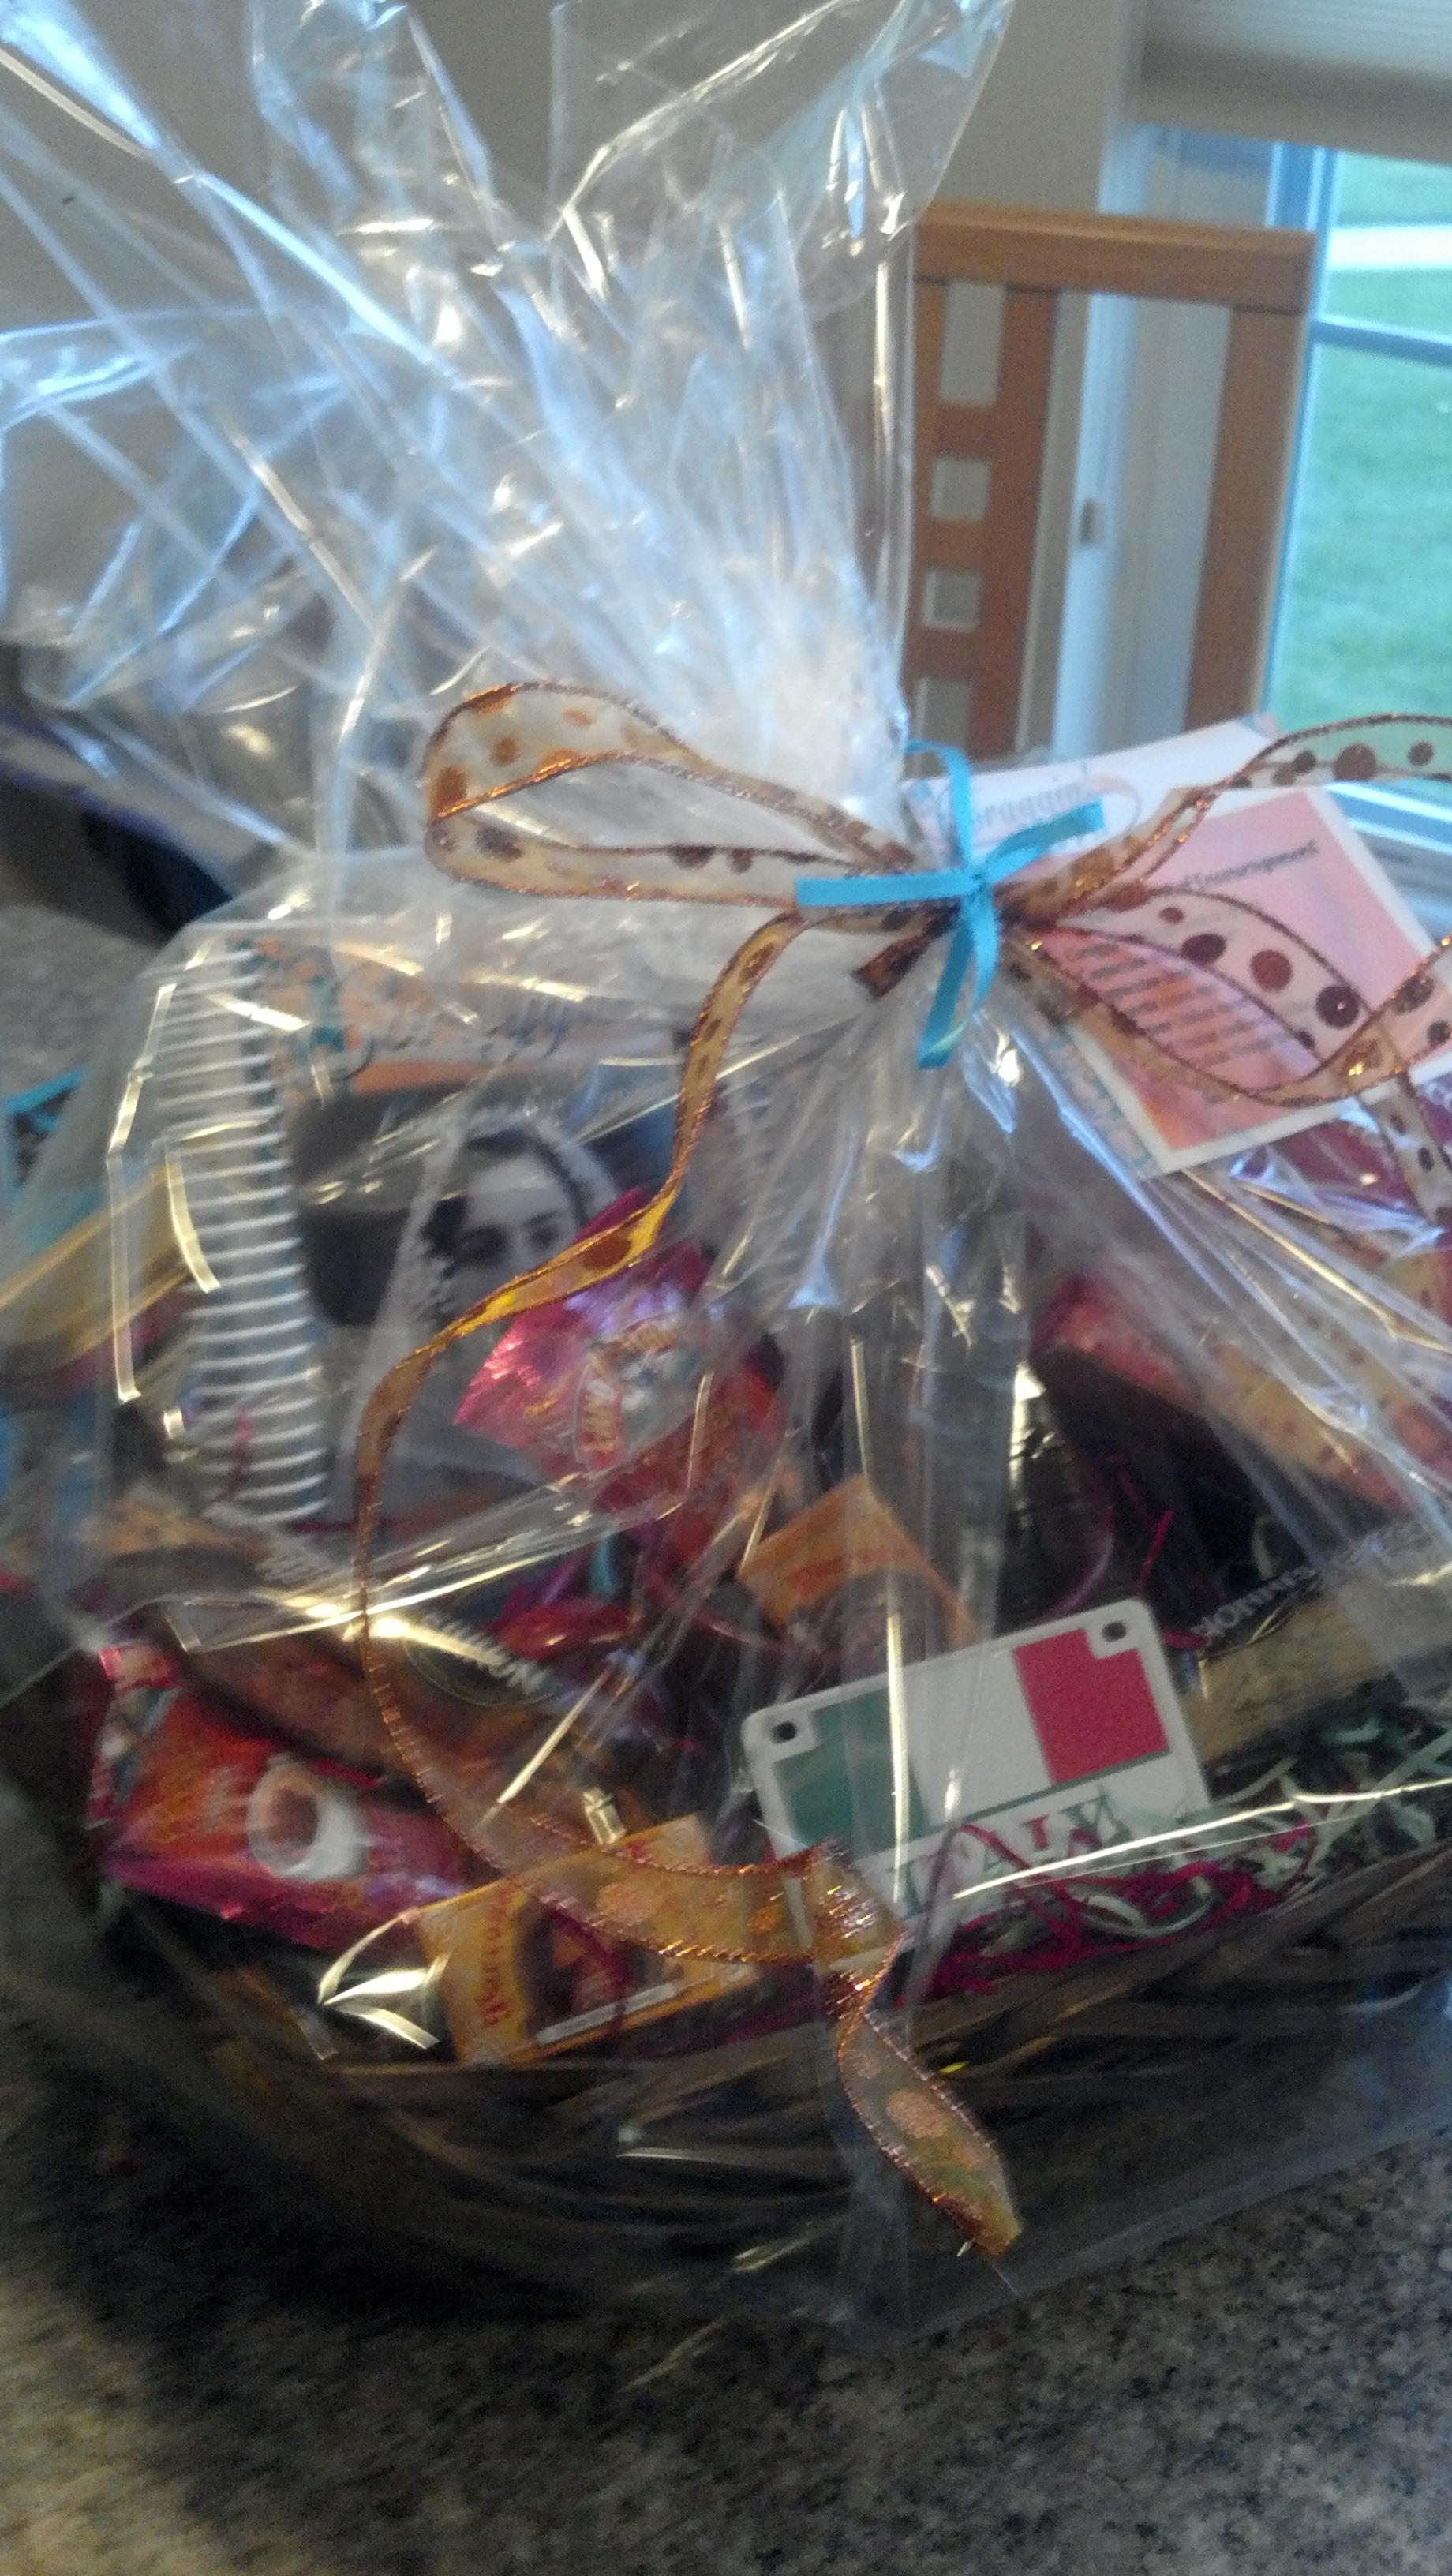 Coraggio Basket of Encouragement - Gift Basket